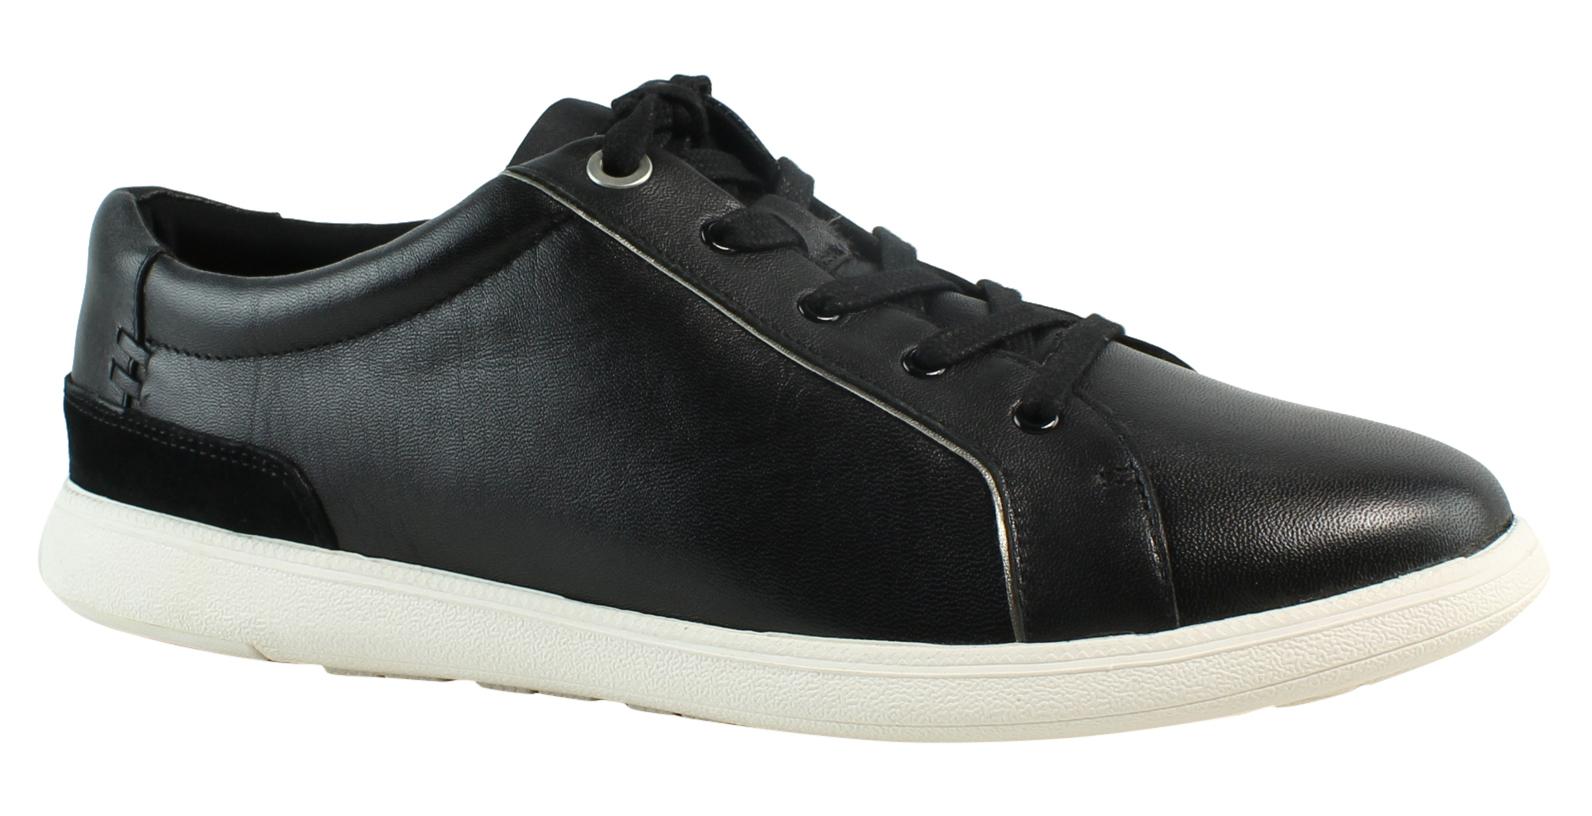 New Foot Petals Femme 71240 Noir Fashion Chaussures